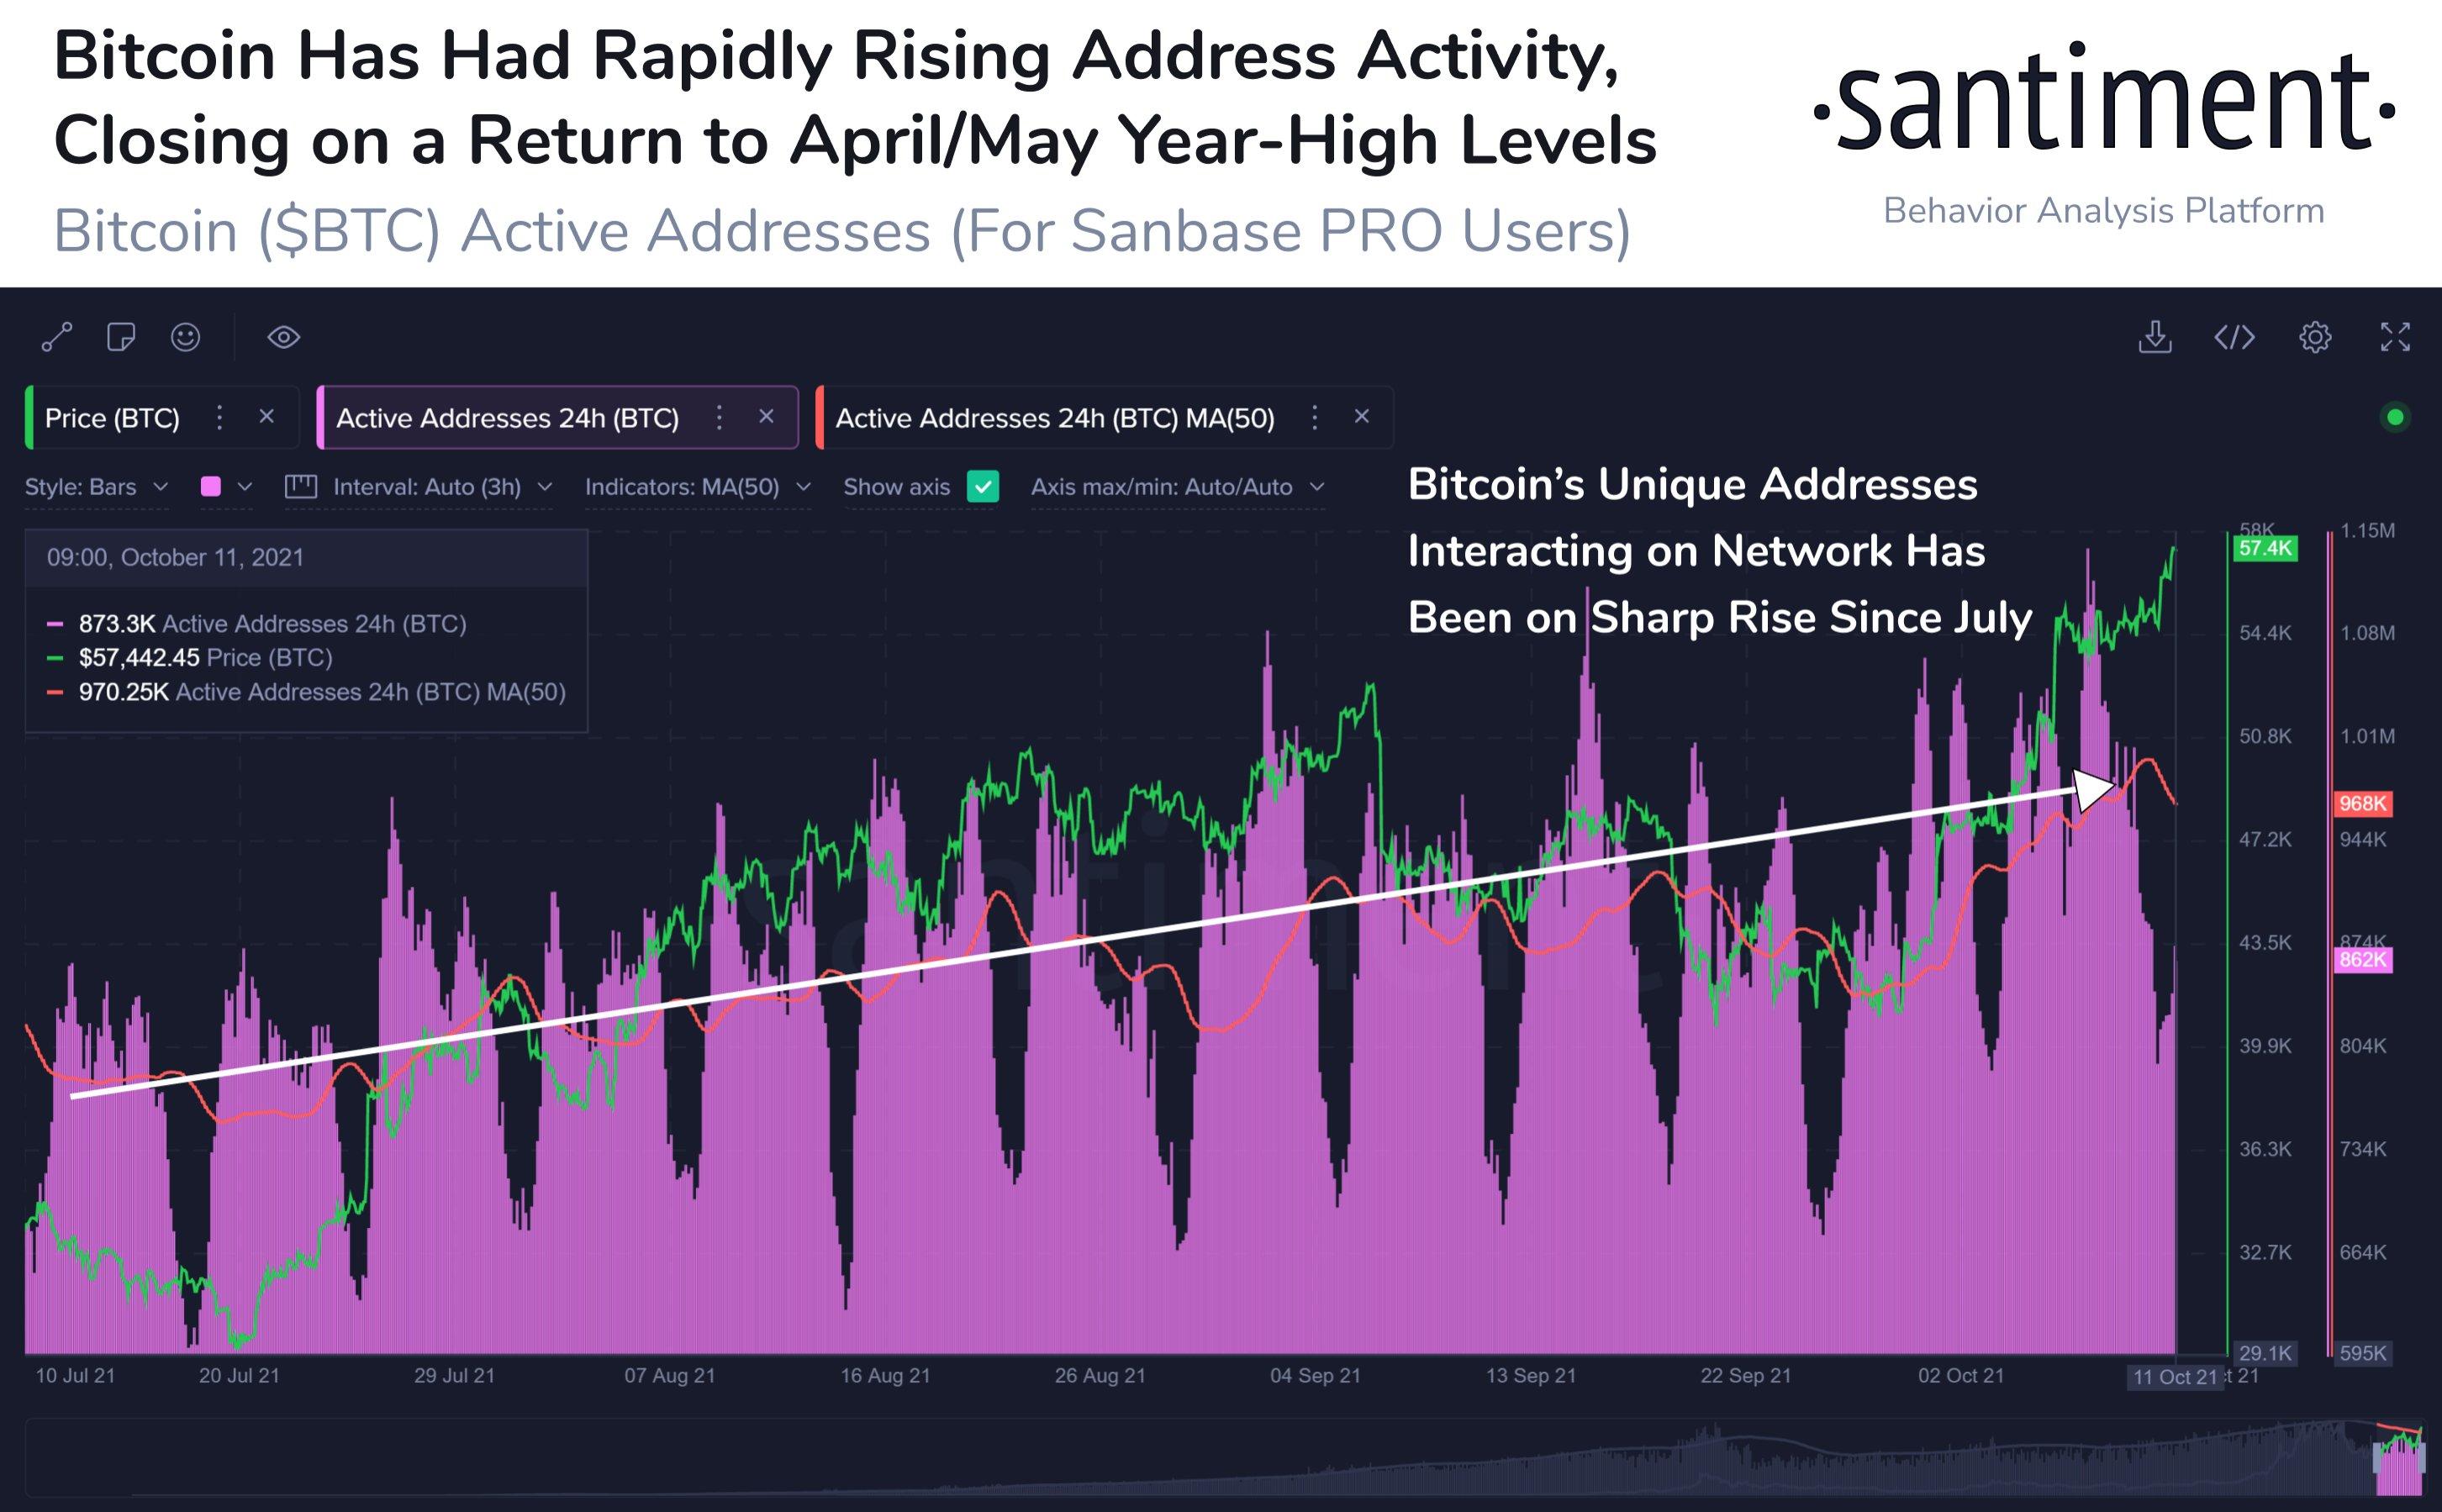 Bitcoin BTC Address Activity - این داده های شبکه ای چشم اندازی صعودی را برای بیت کوین نشان می دهند